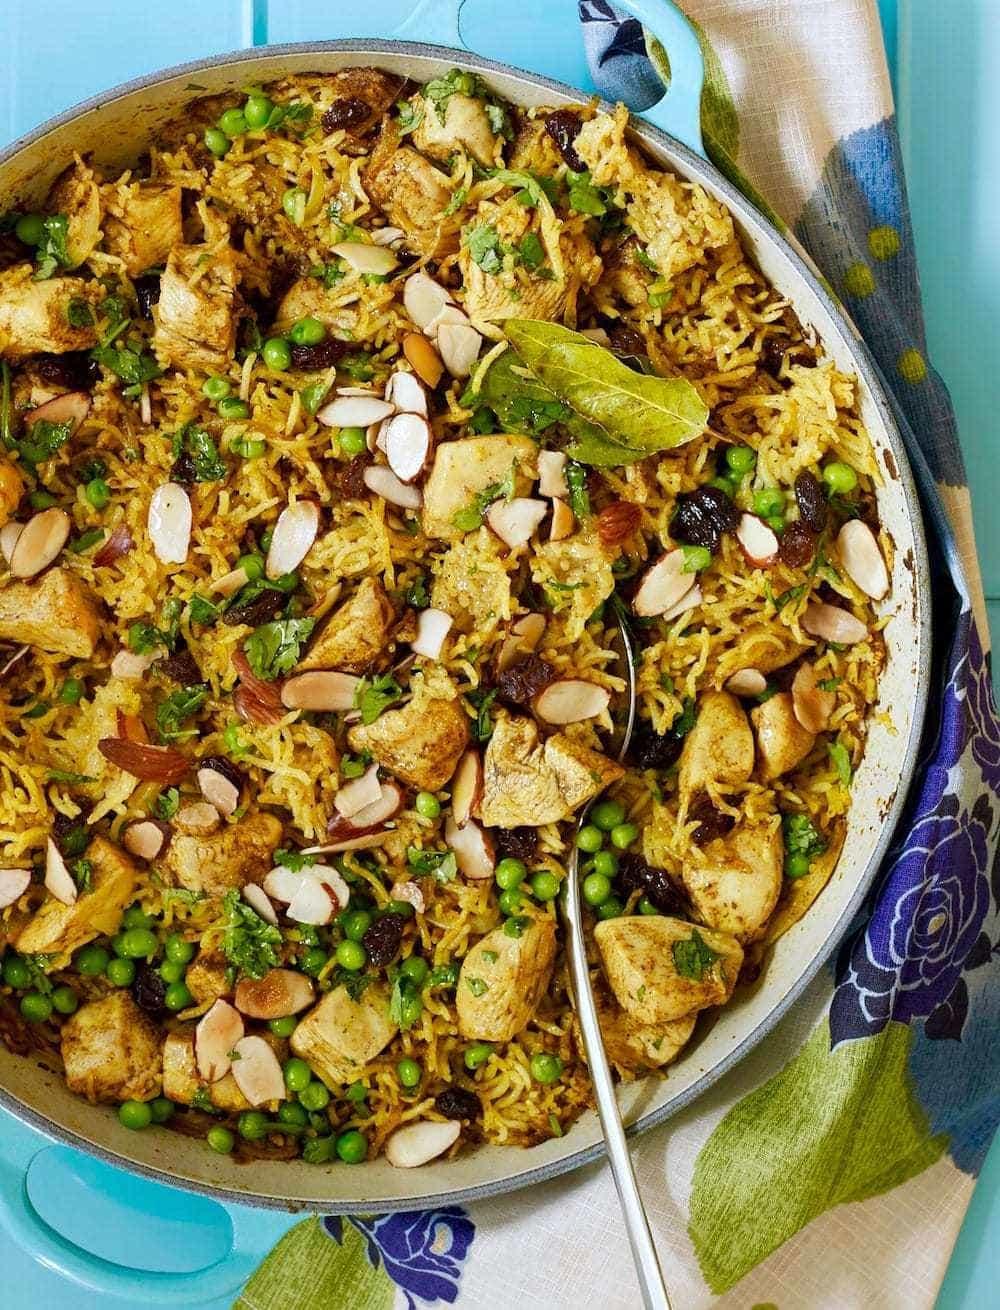 Chicken Biryani in a le creuset casserole on blue surface